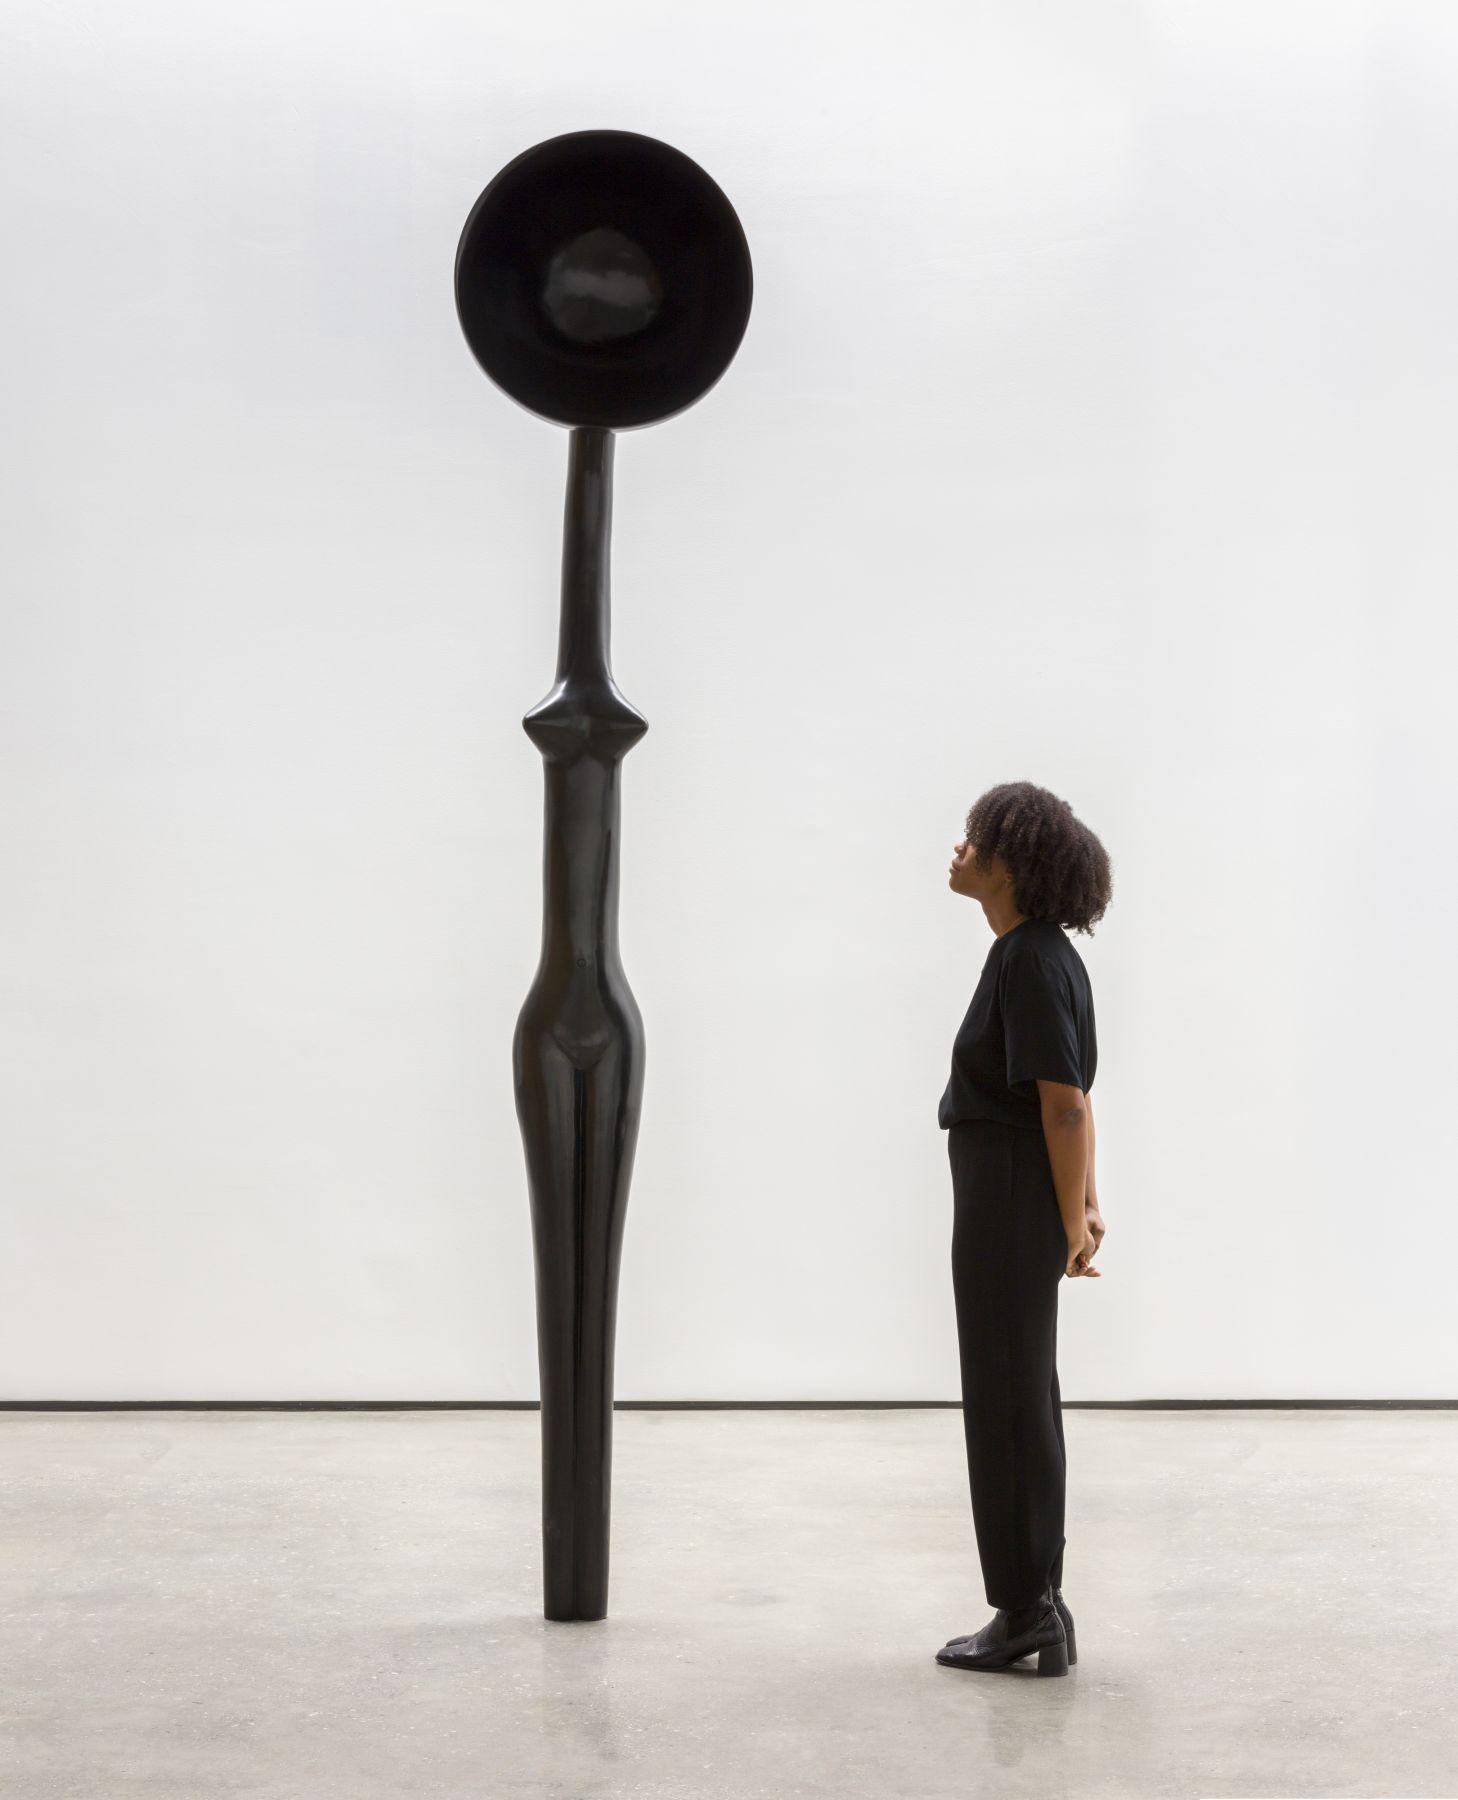 An image of Simone Leigh's